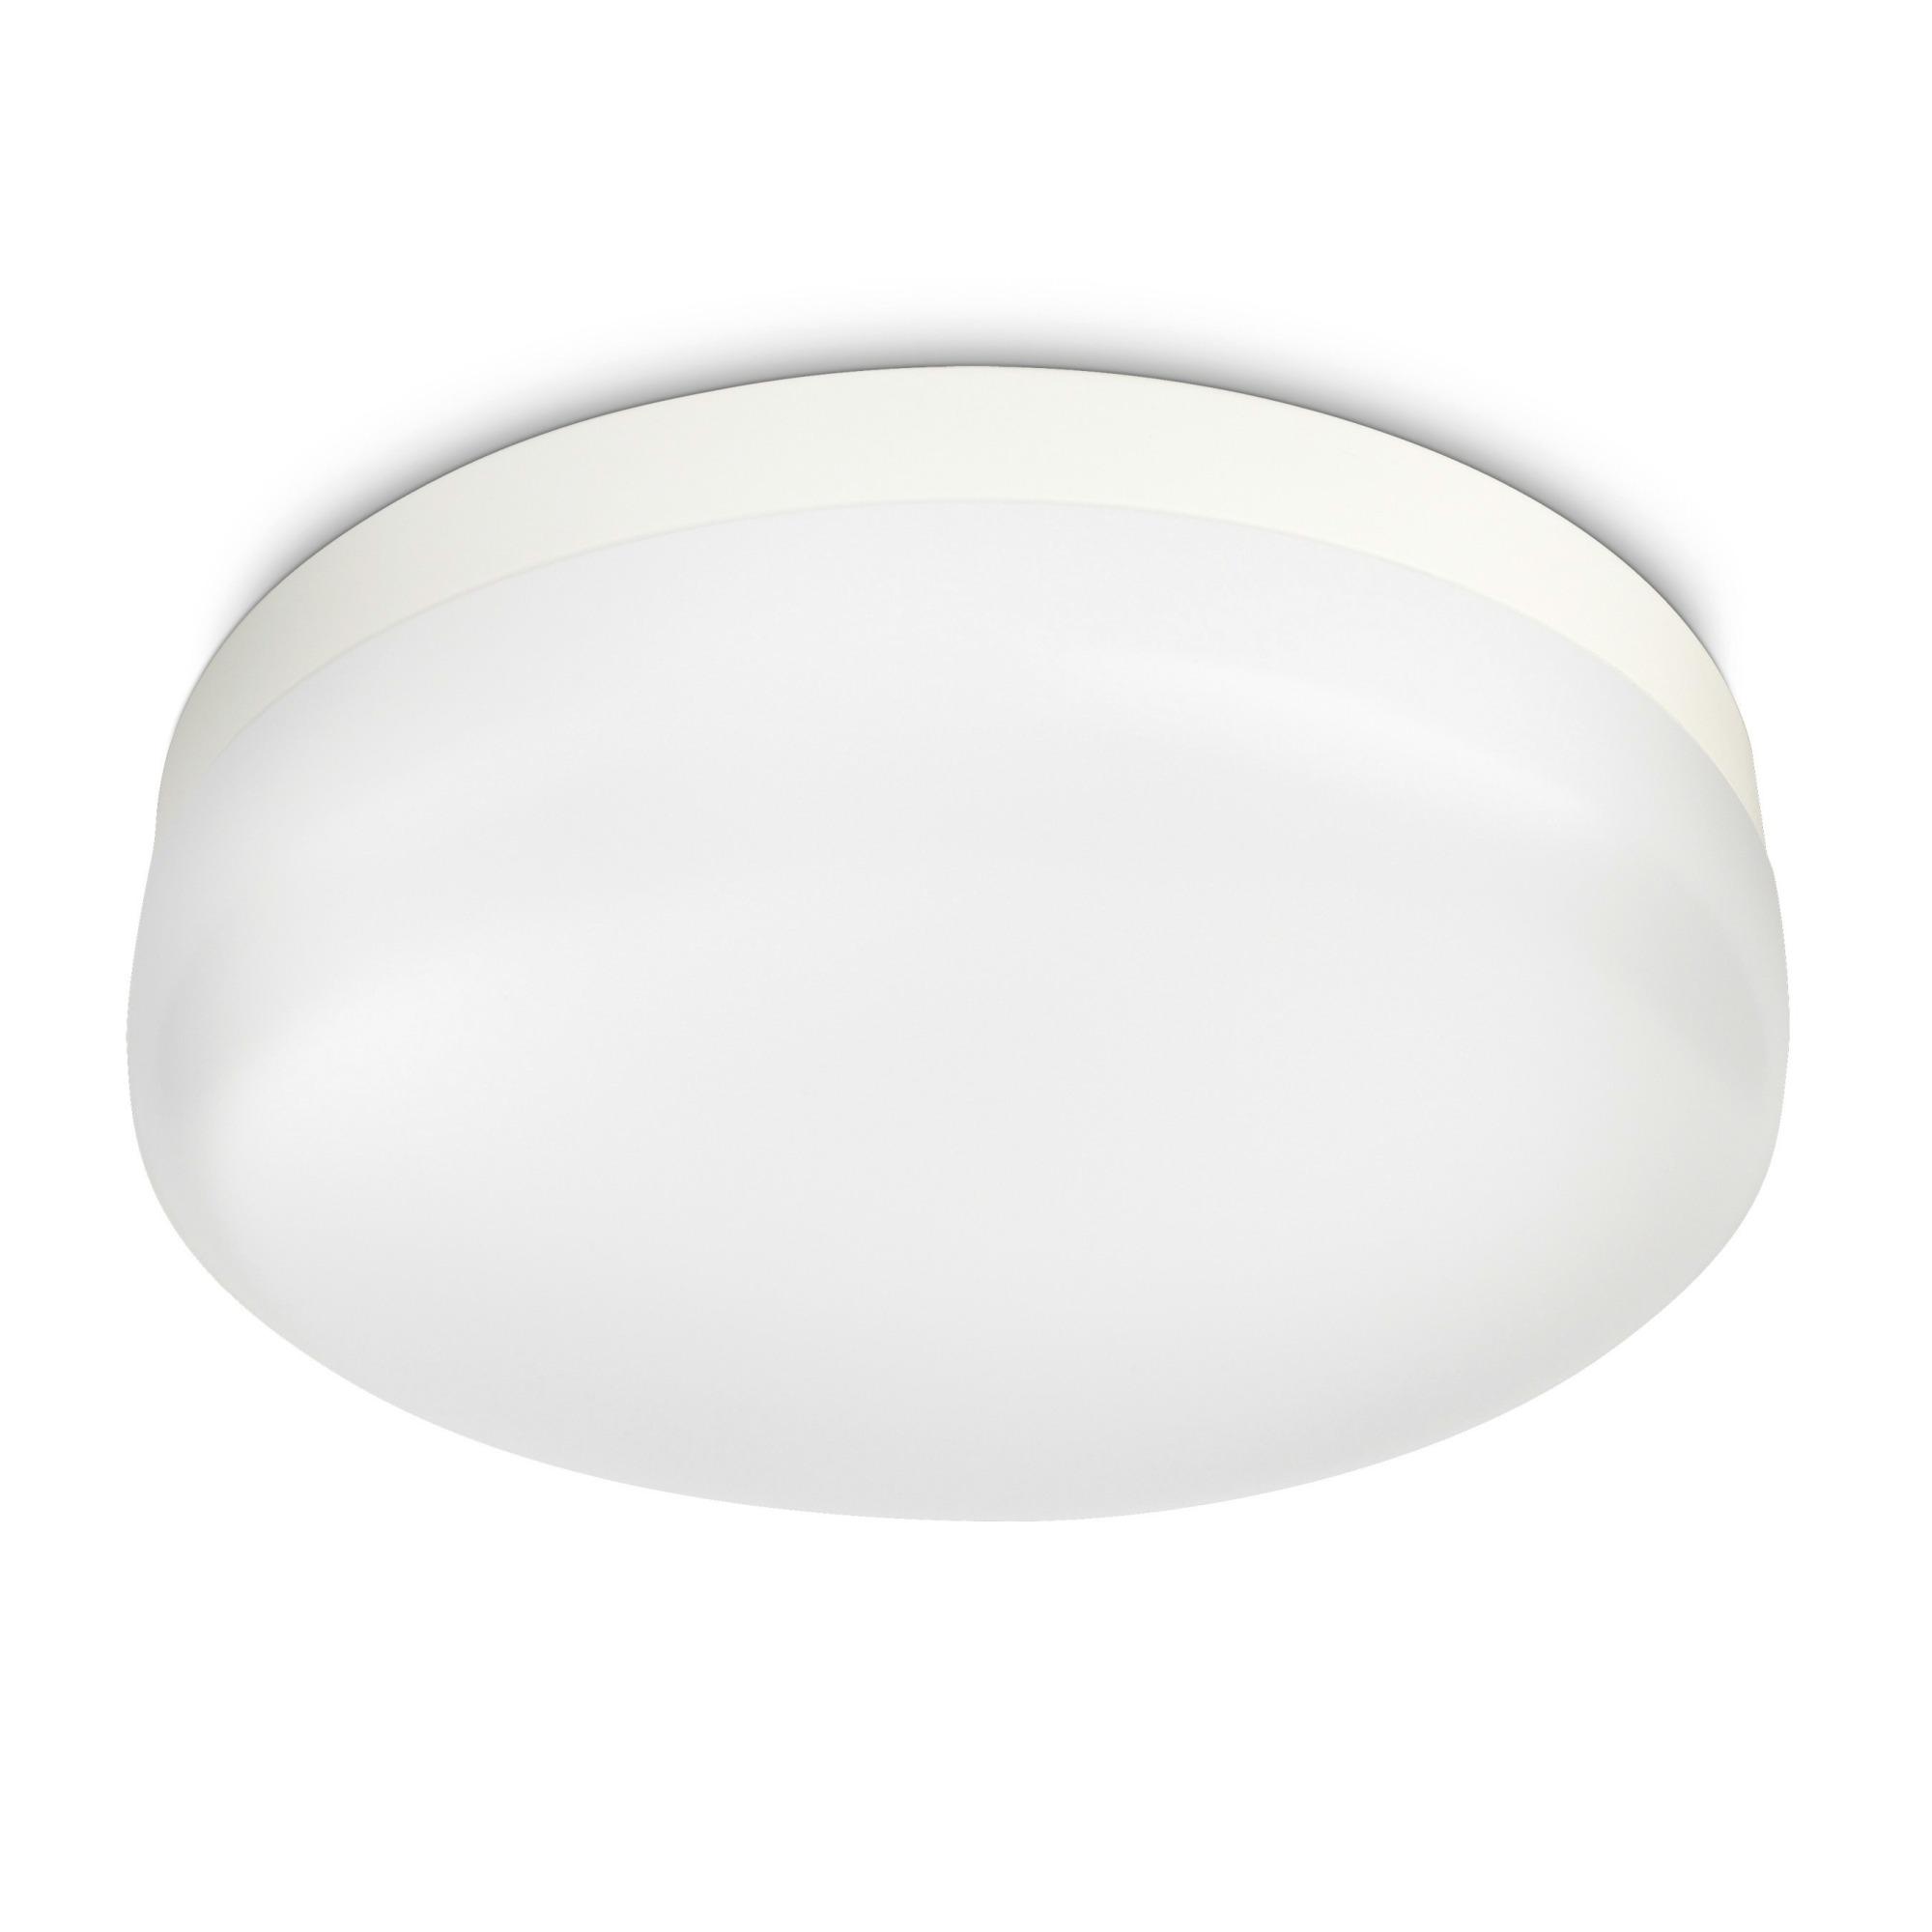 Philips Mybathroom Baume LED-plafondlamp 2.5 W Warmwit Wit